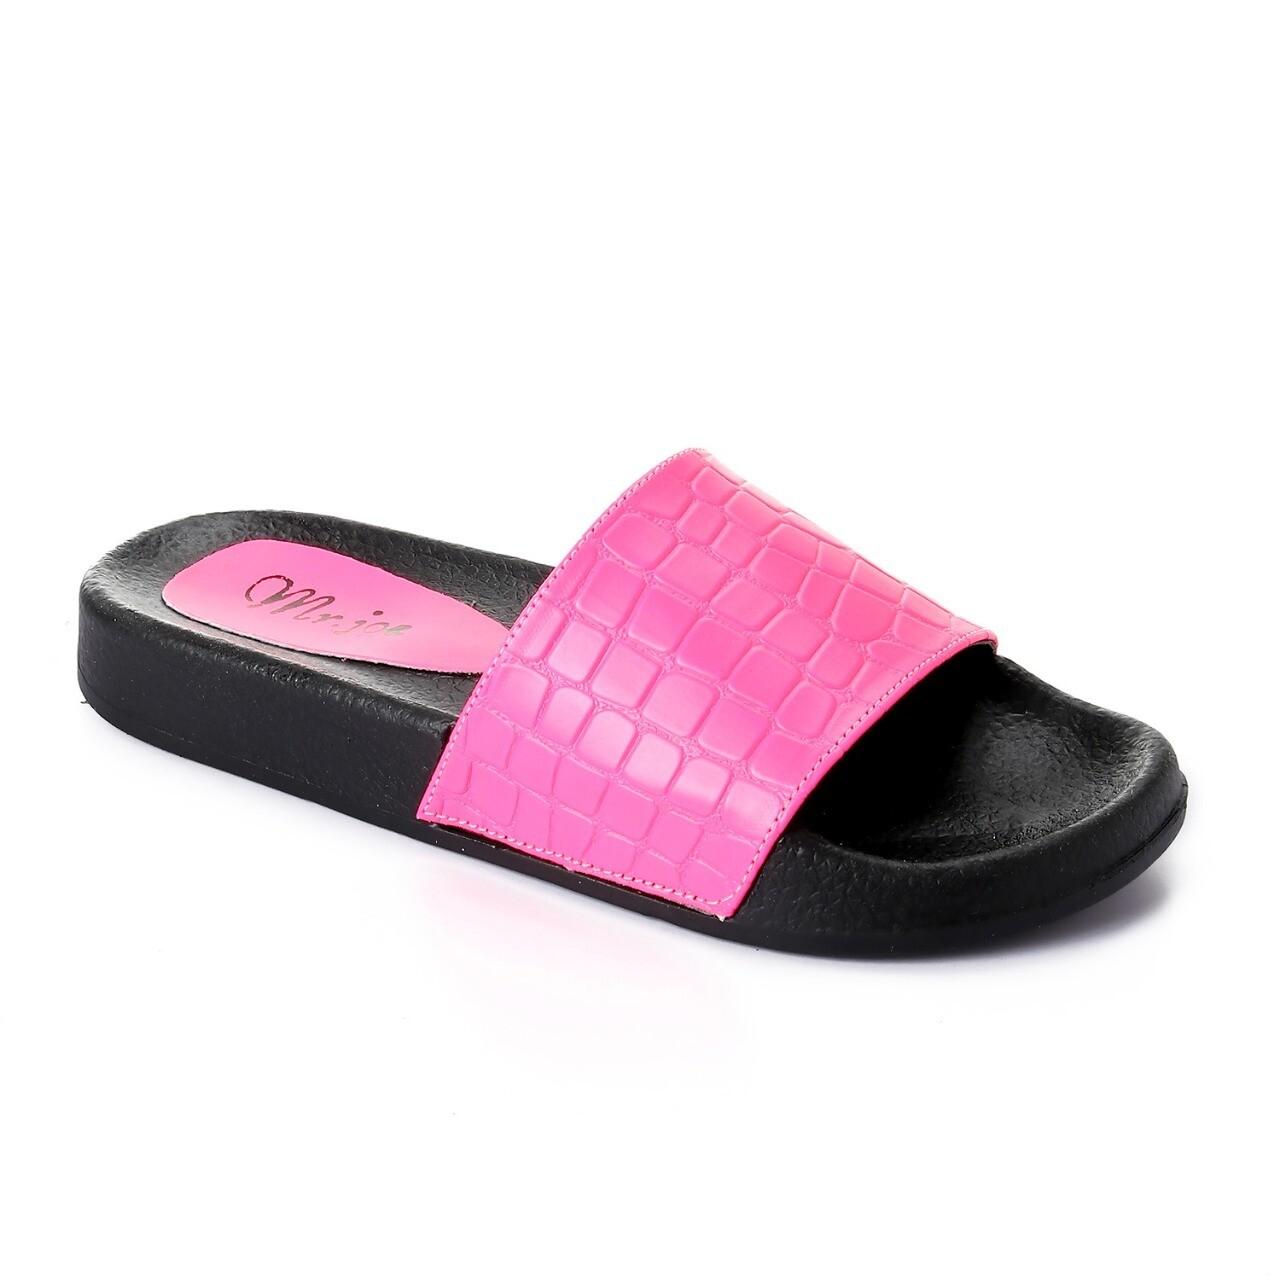 3438 Slipper - fushia crocodile